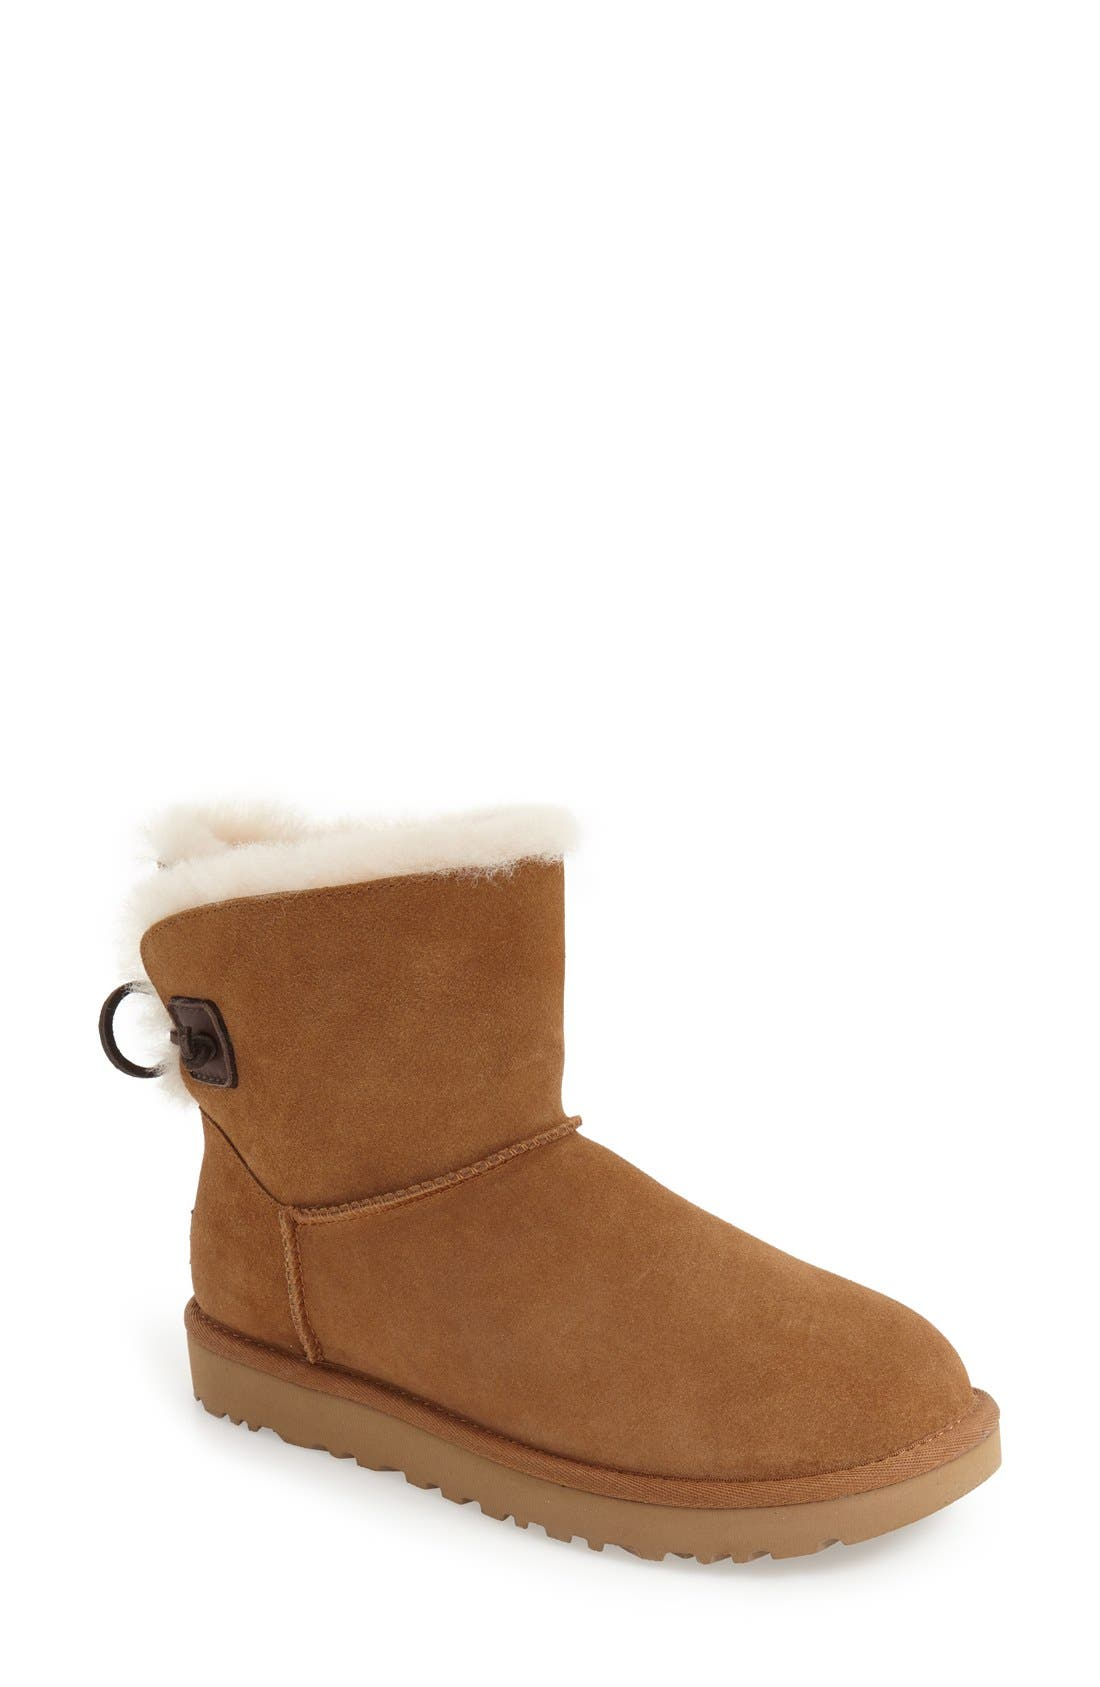 Alternate Image 1 Selected - UGG® Adoria - Tehuano Short Boot (Women)